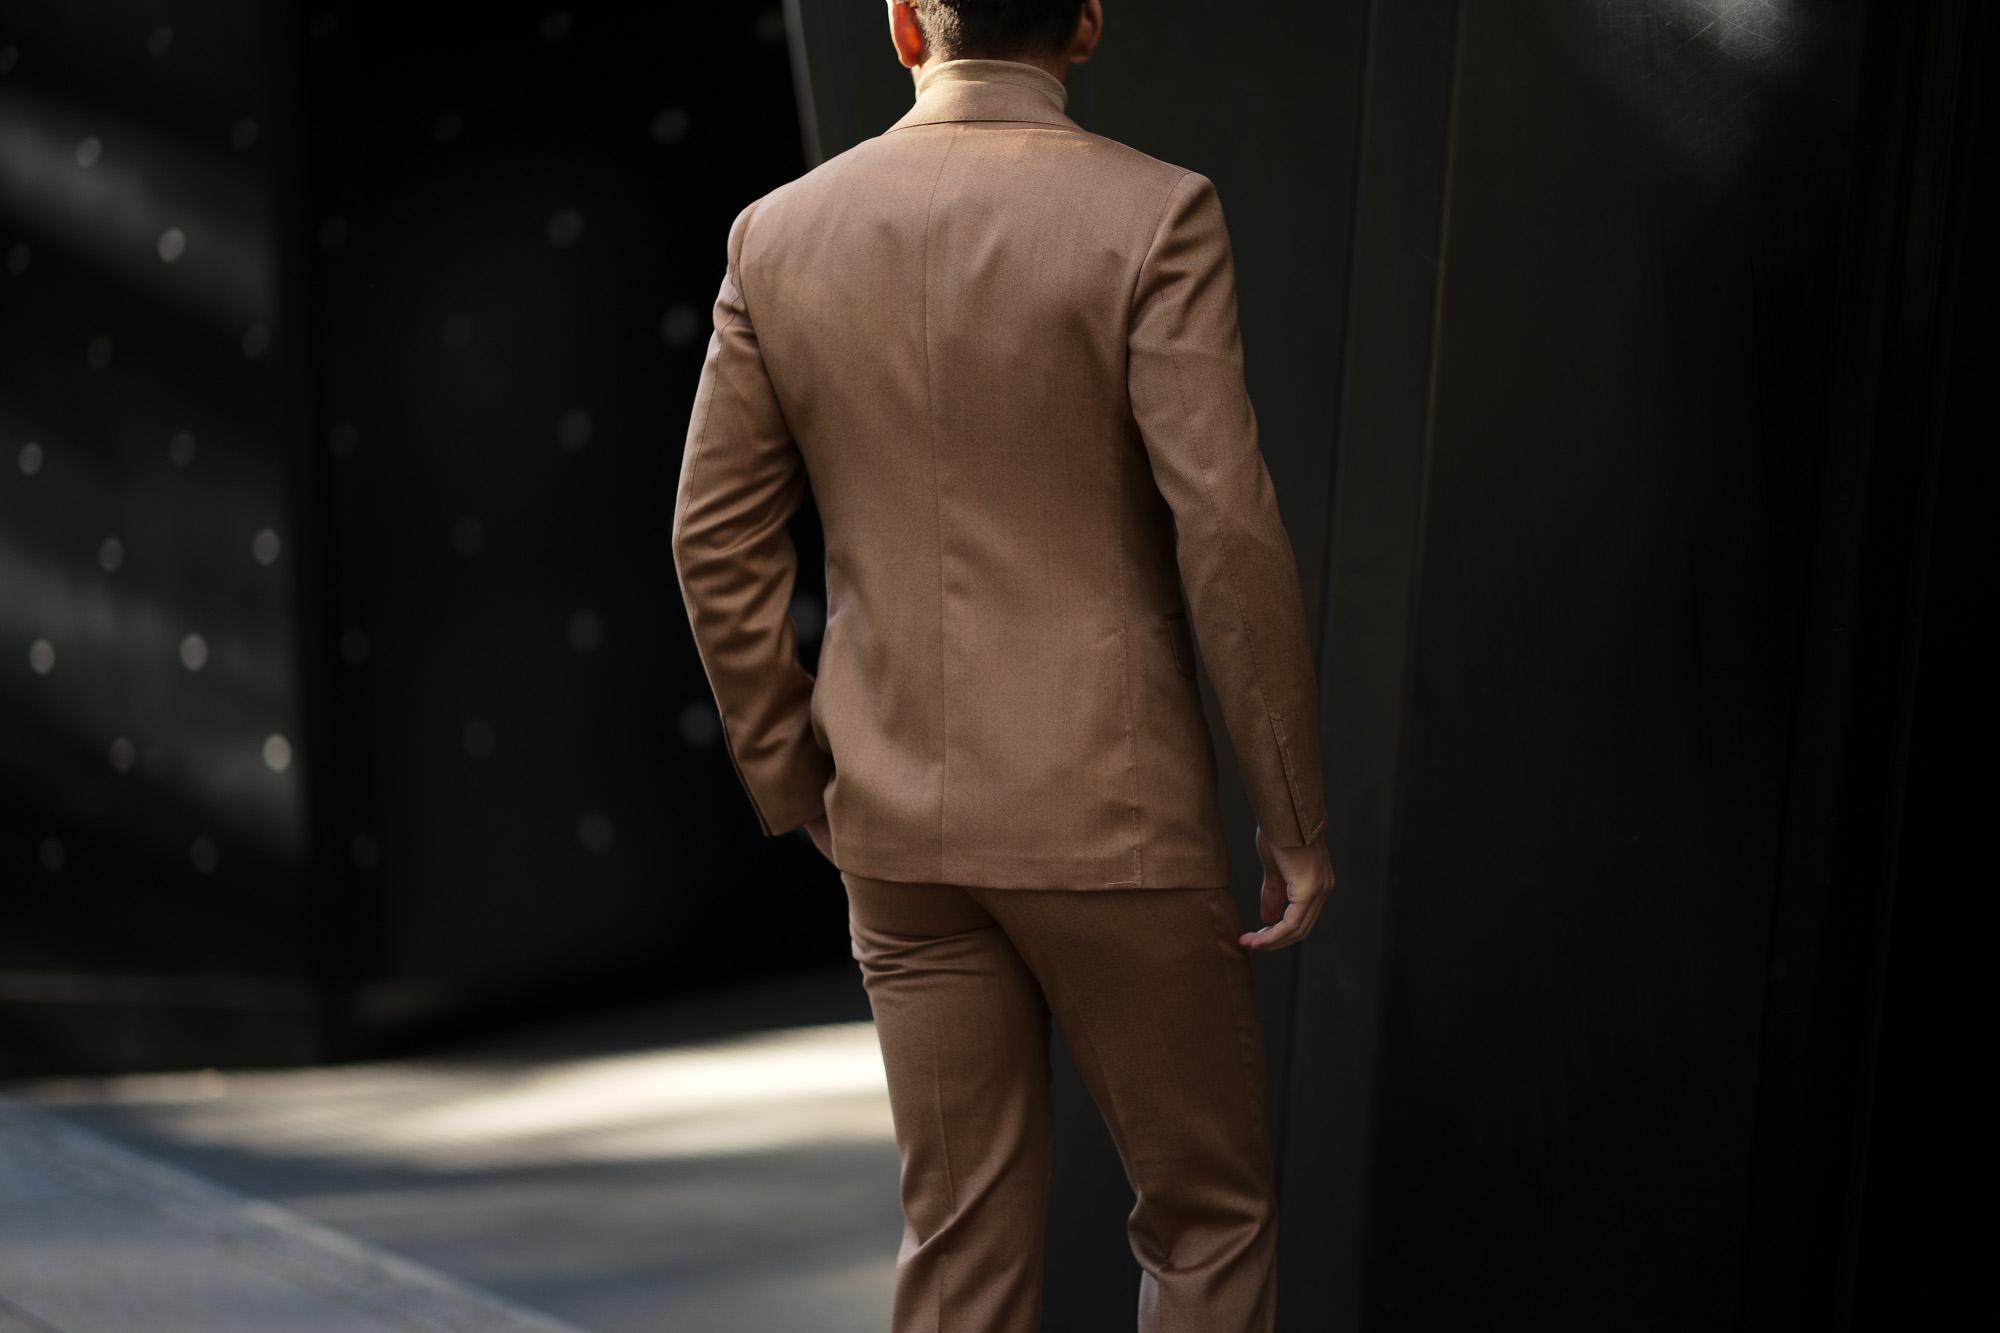 LARDINI (ラルディーニ) SARTORIA (サルトリア) SOLARO ソラーロ 3P スーツ BEIGE (ベージュ・1) Made in italy (イタリア製) 2018 秋冬新作 愛知 名古屋 alto e diritto altoediritto アルトエデリット